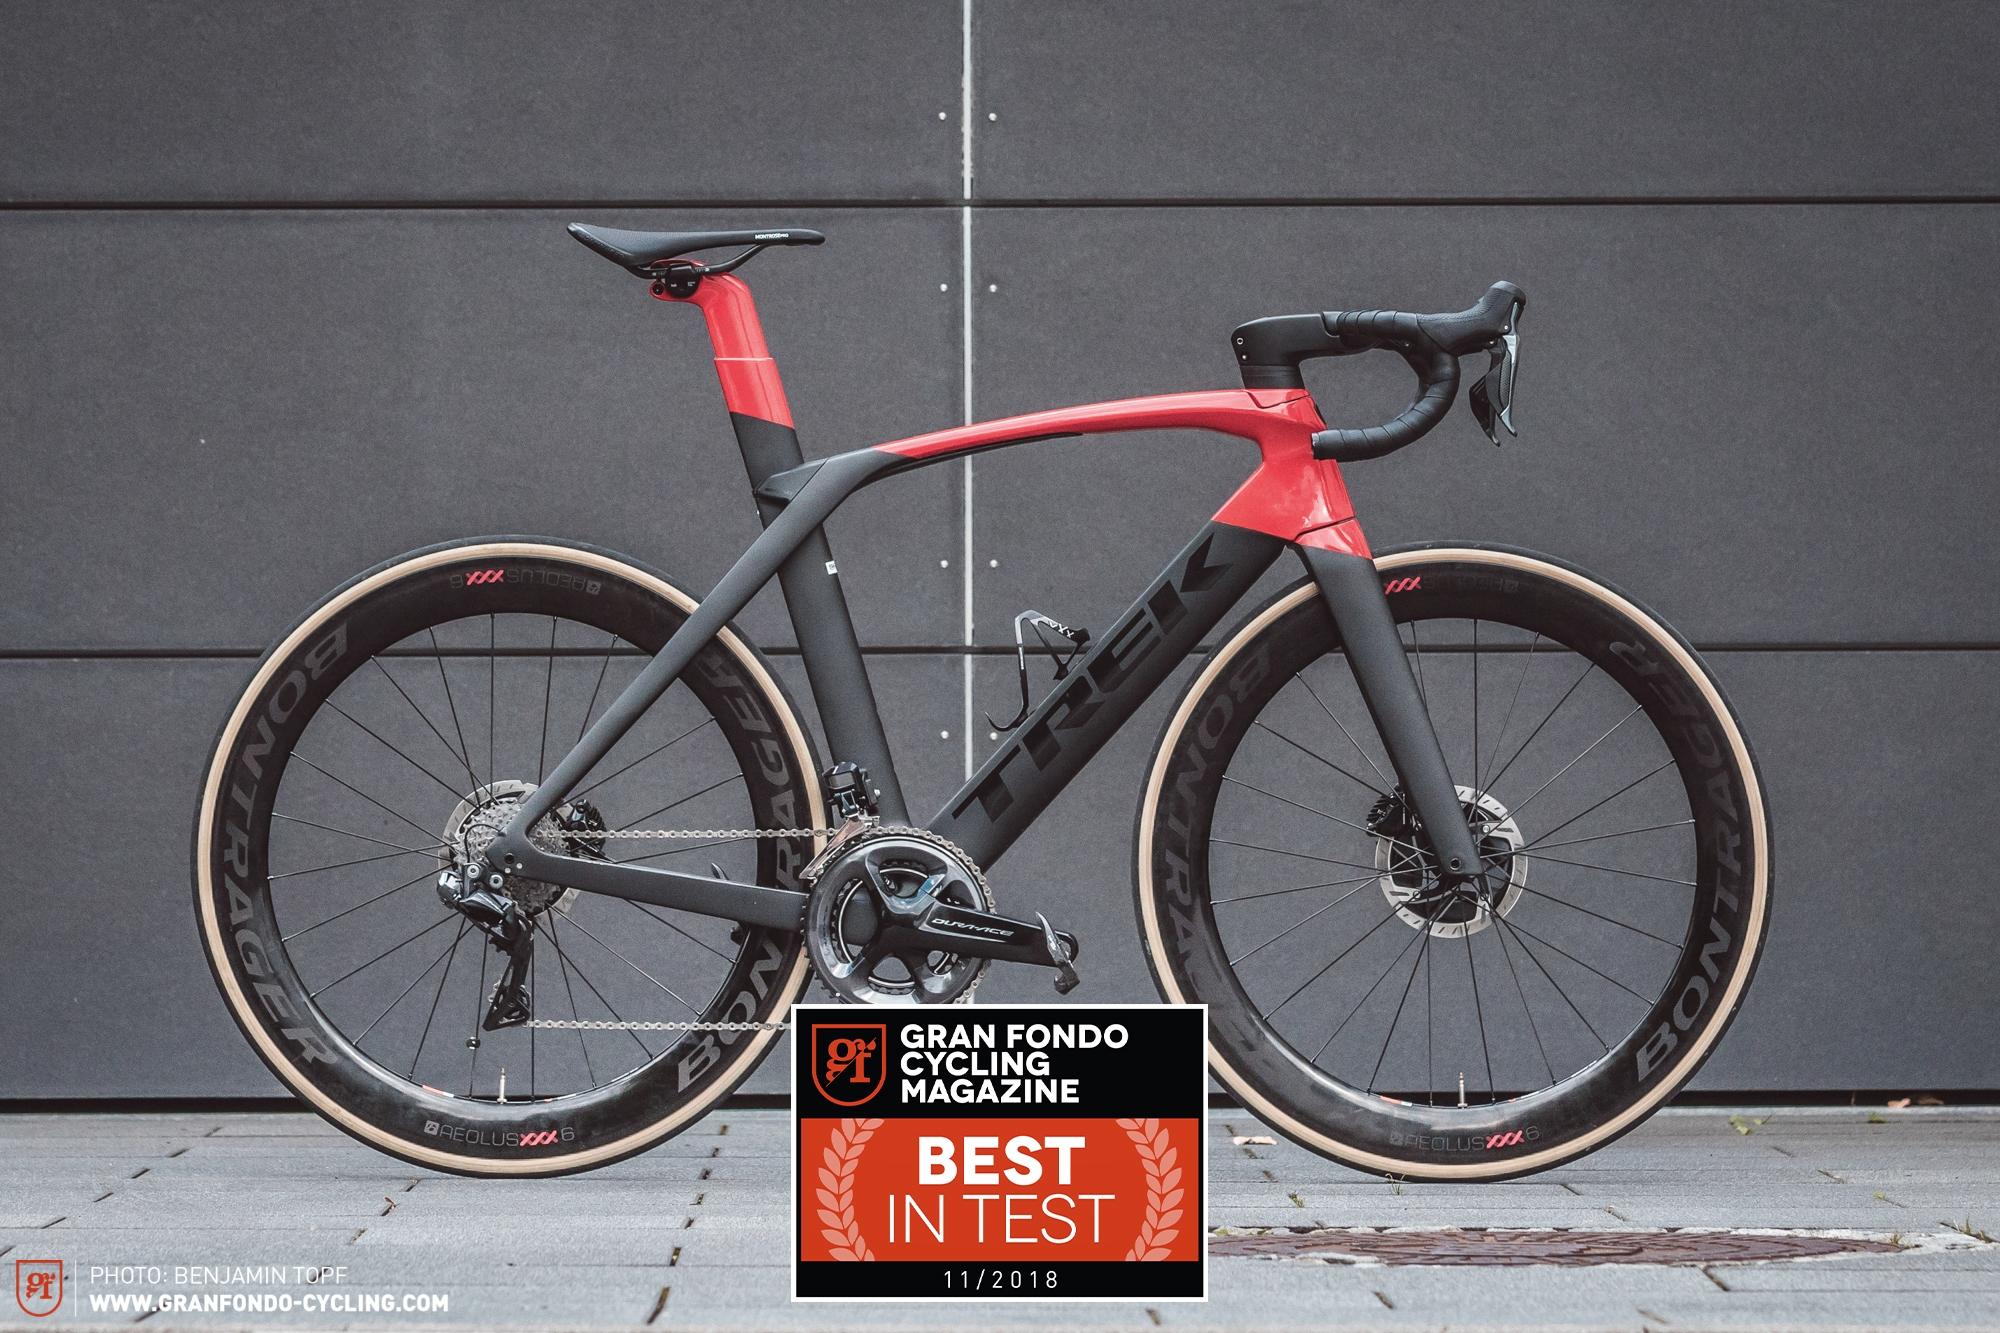 GF_010-Aero-Race-Bike-Test-Review-Trek-Madone-BestinTest.jpg